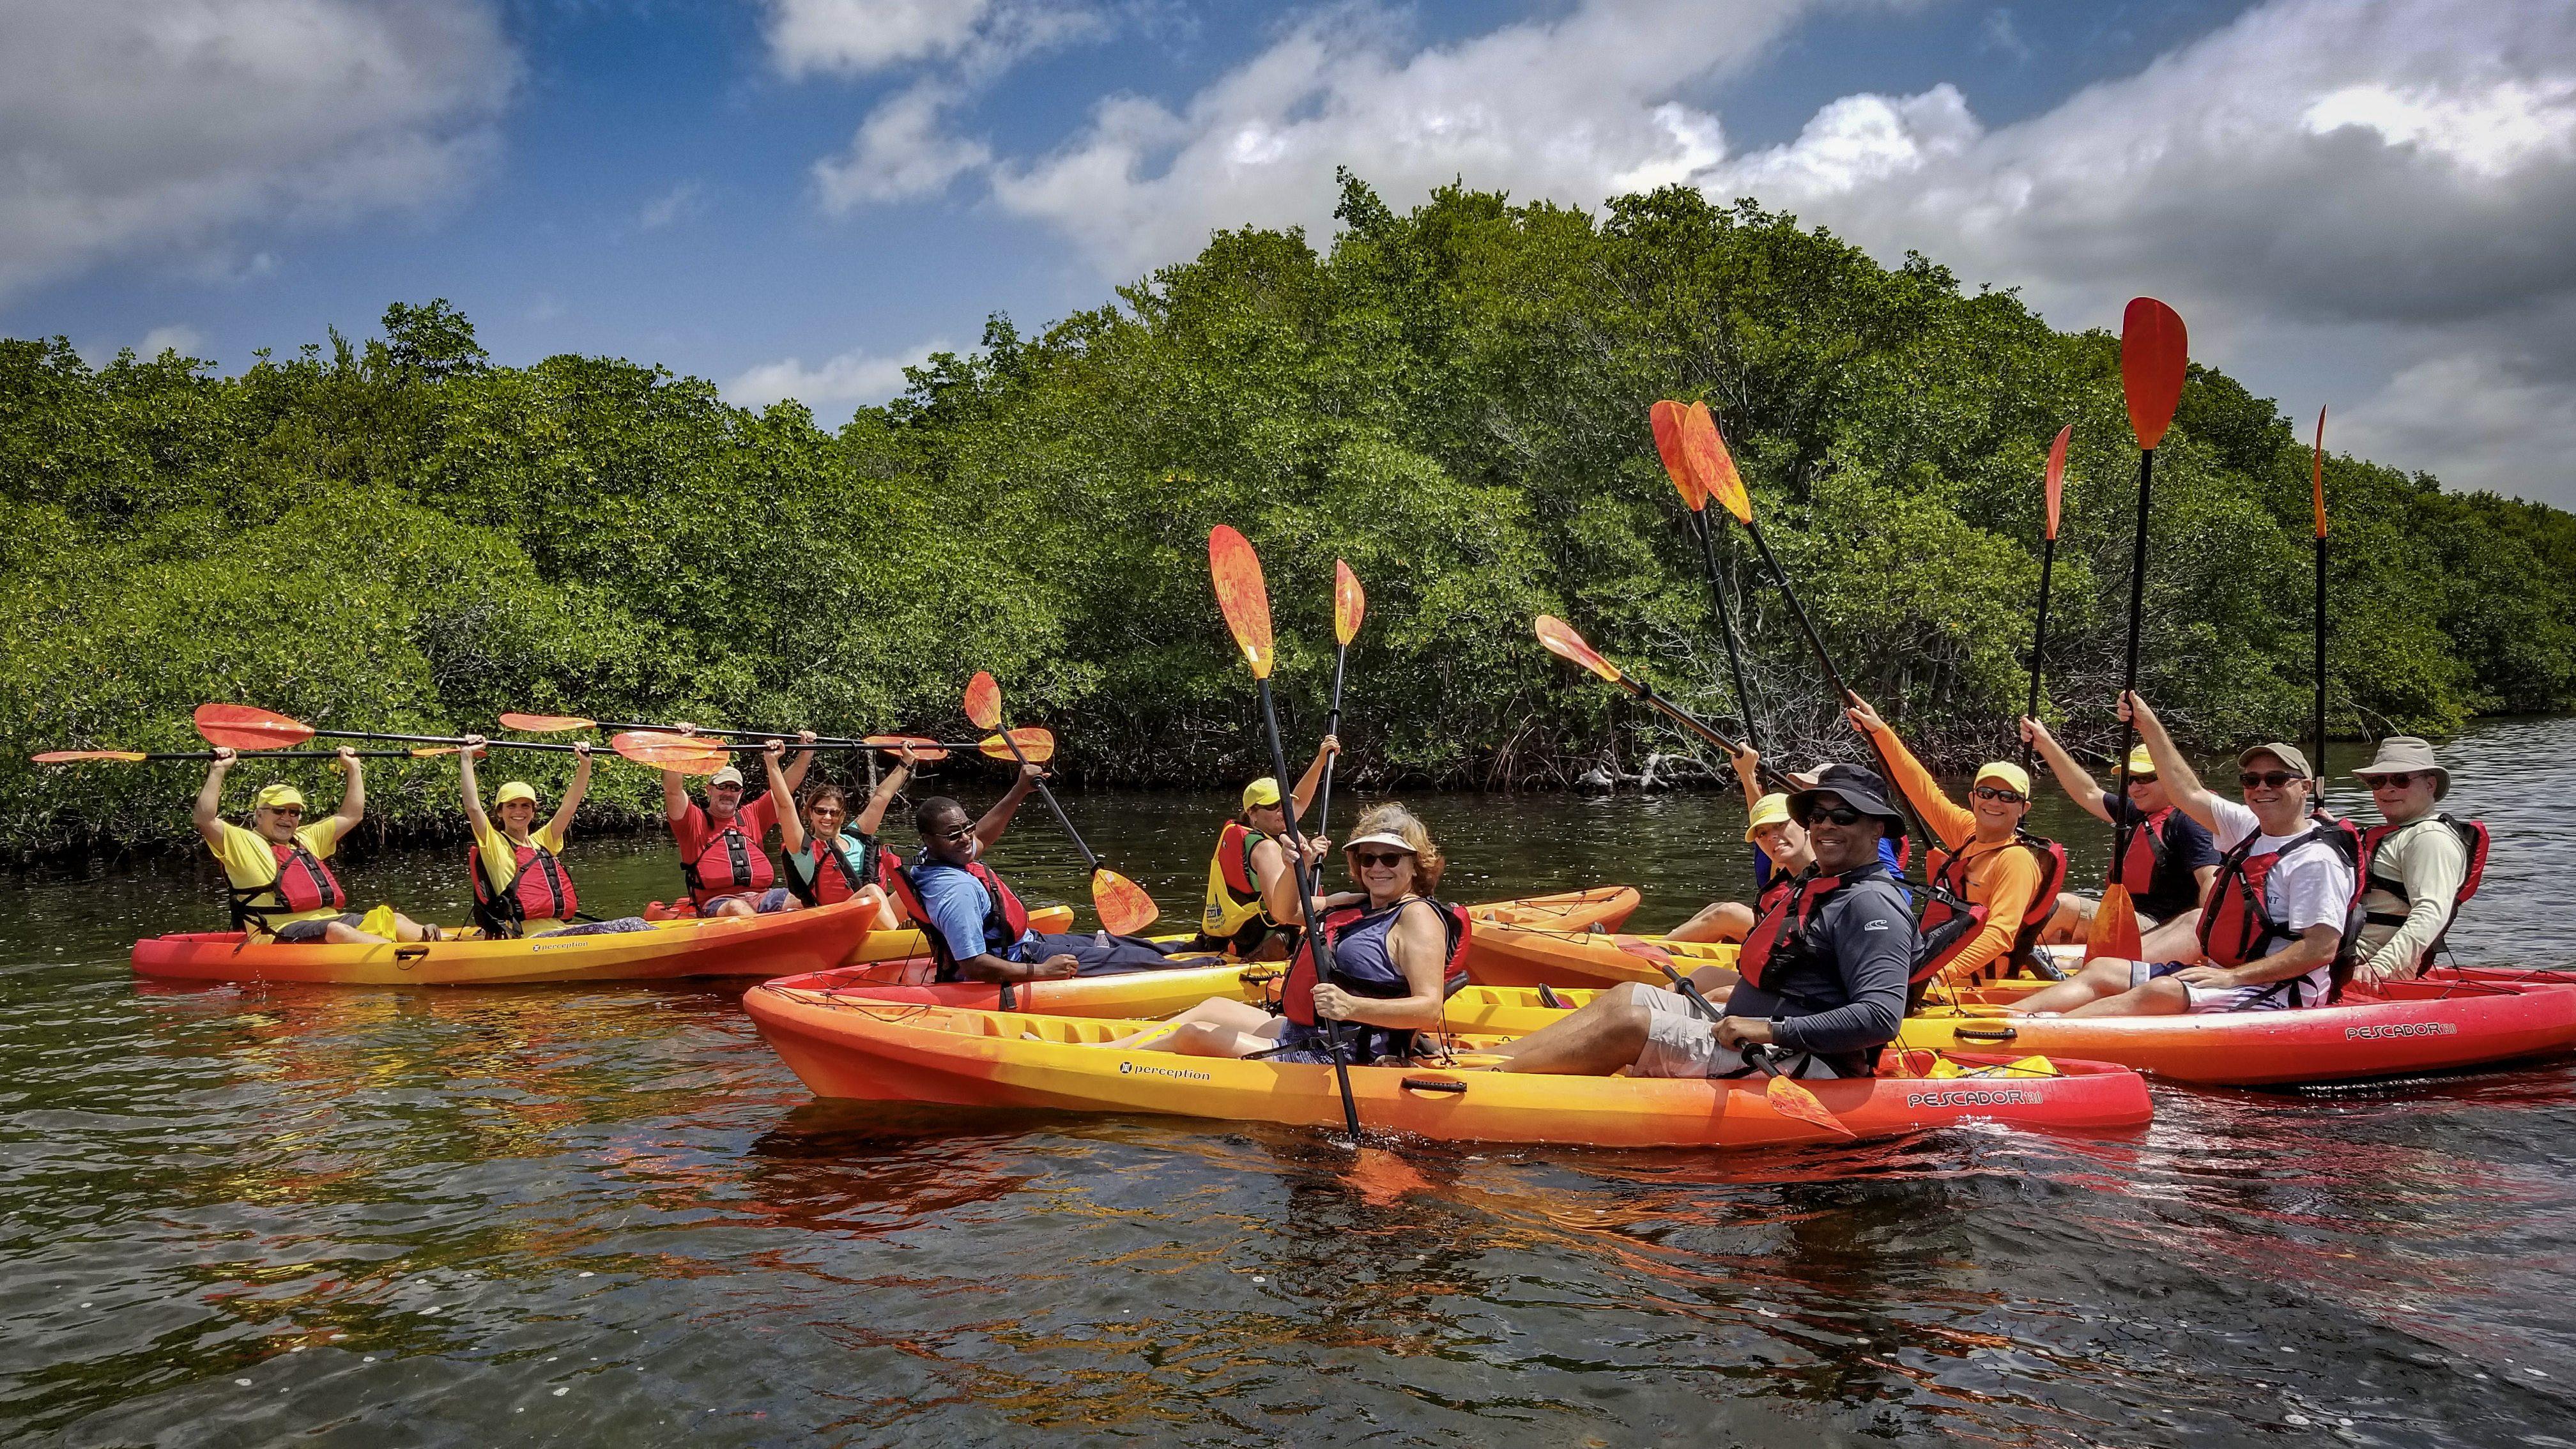 Group of kayakers kayaking through the mangroves by Deering Estate